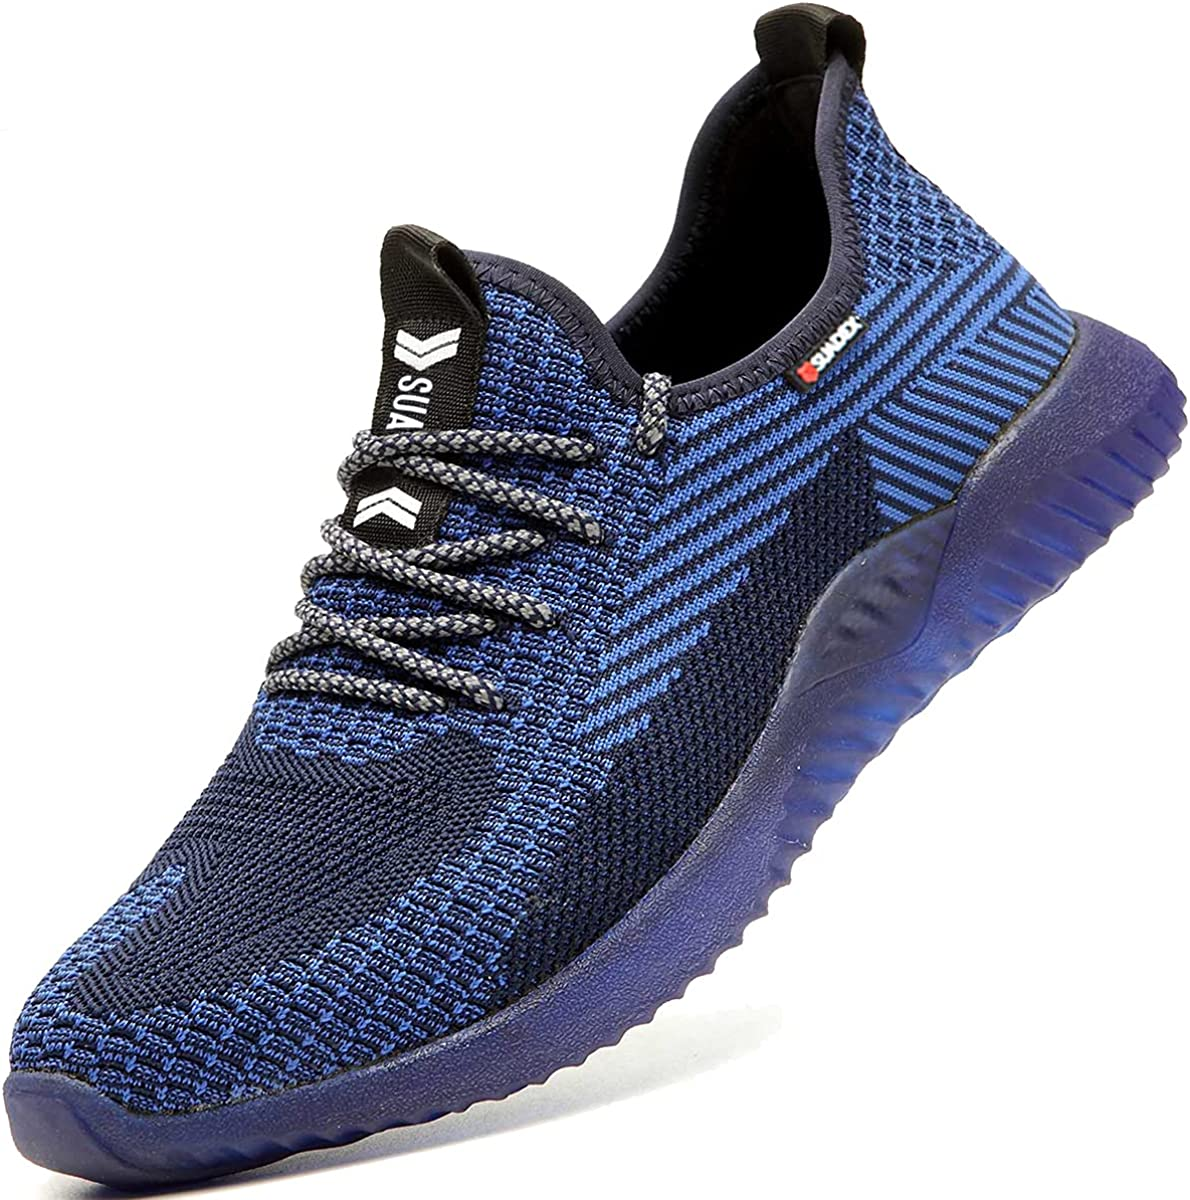 SUADEX Indestructible Steel Toe Work Cheap Ranking TOP13 SALE Start Men Shoes for Lightwe Women